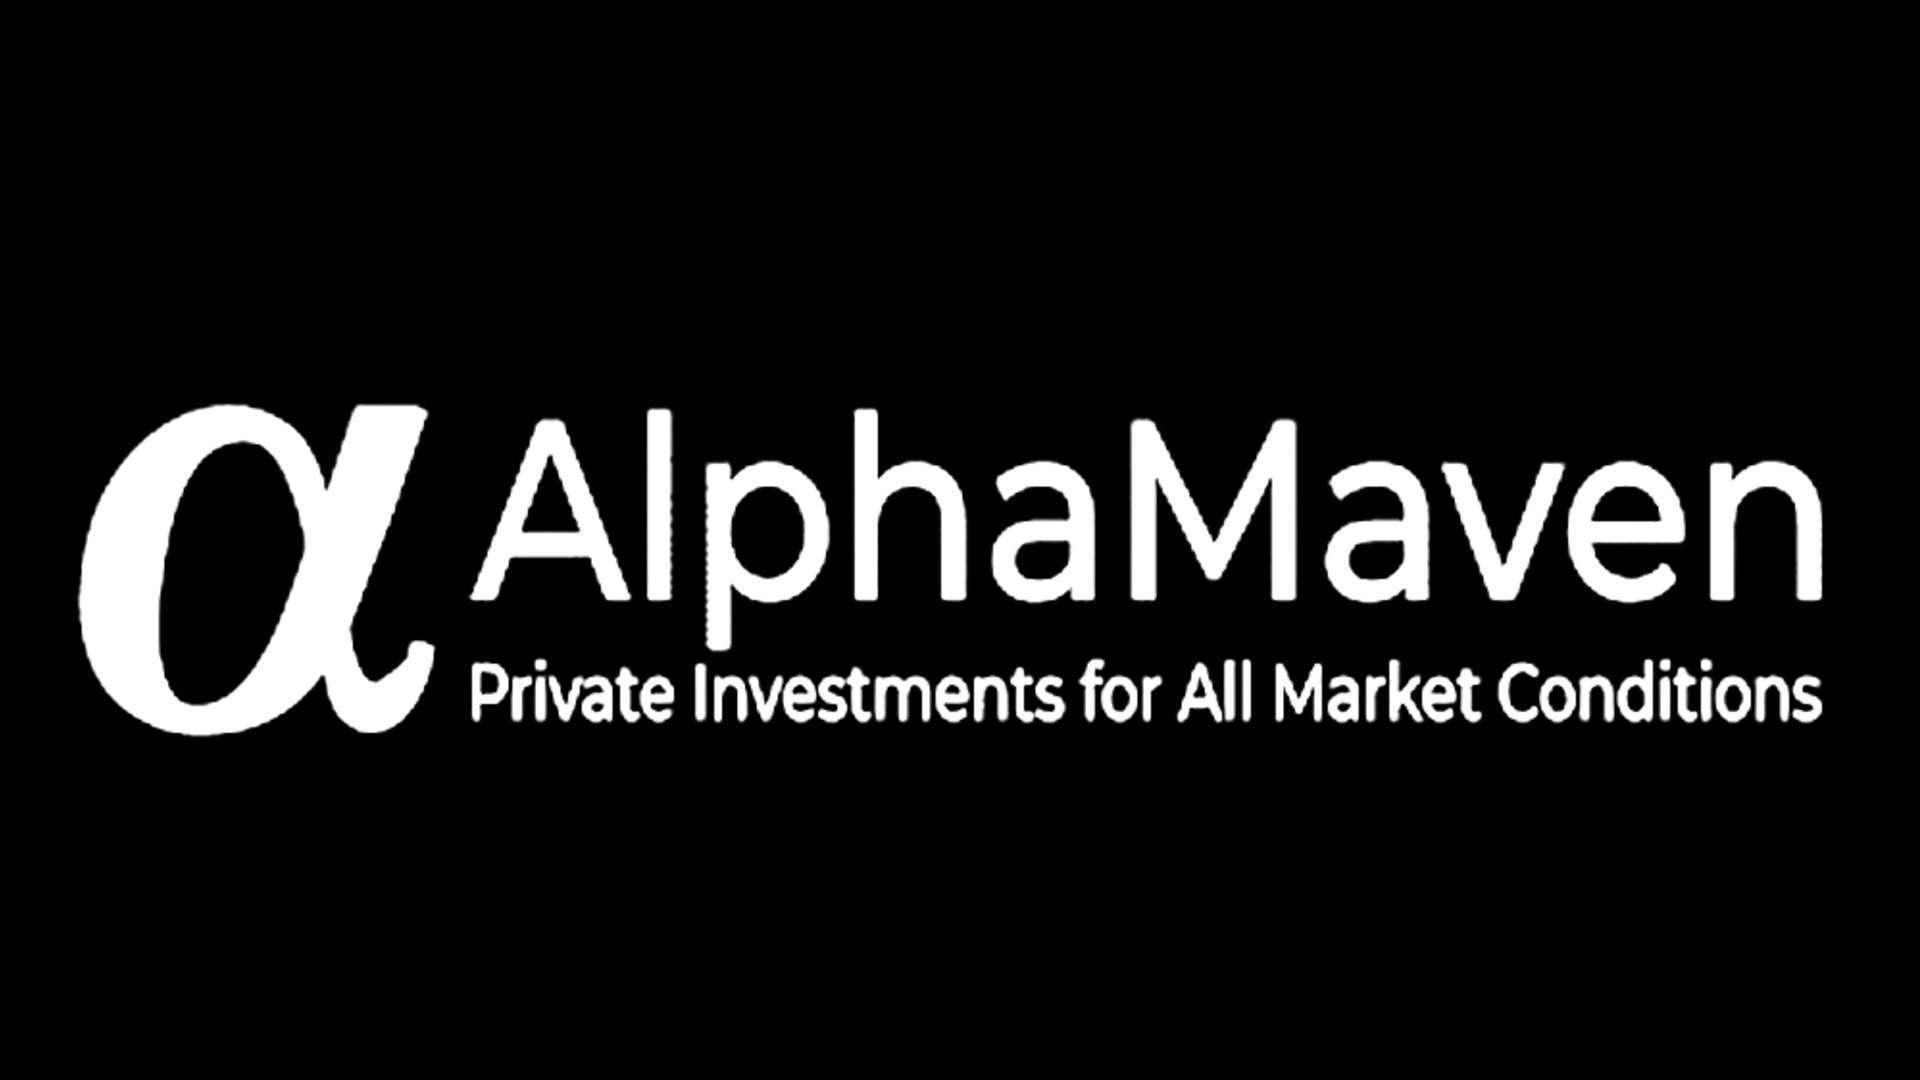 01 Alpha Maven